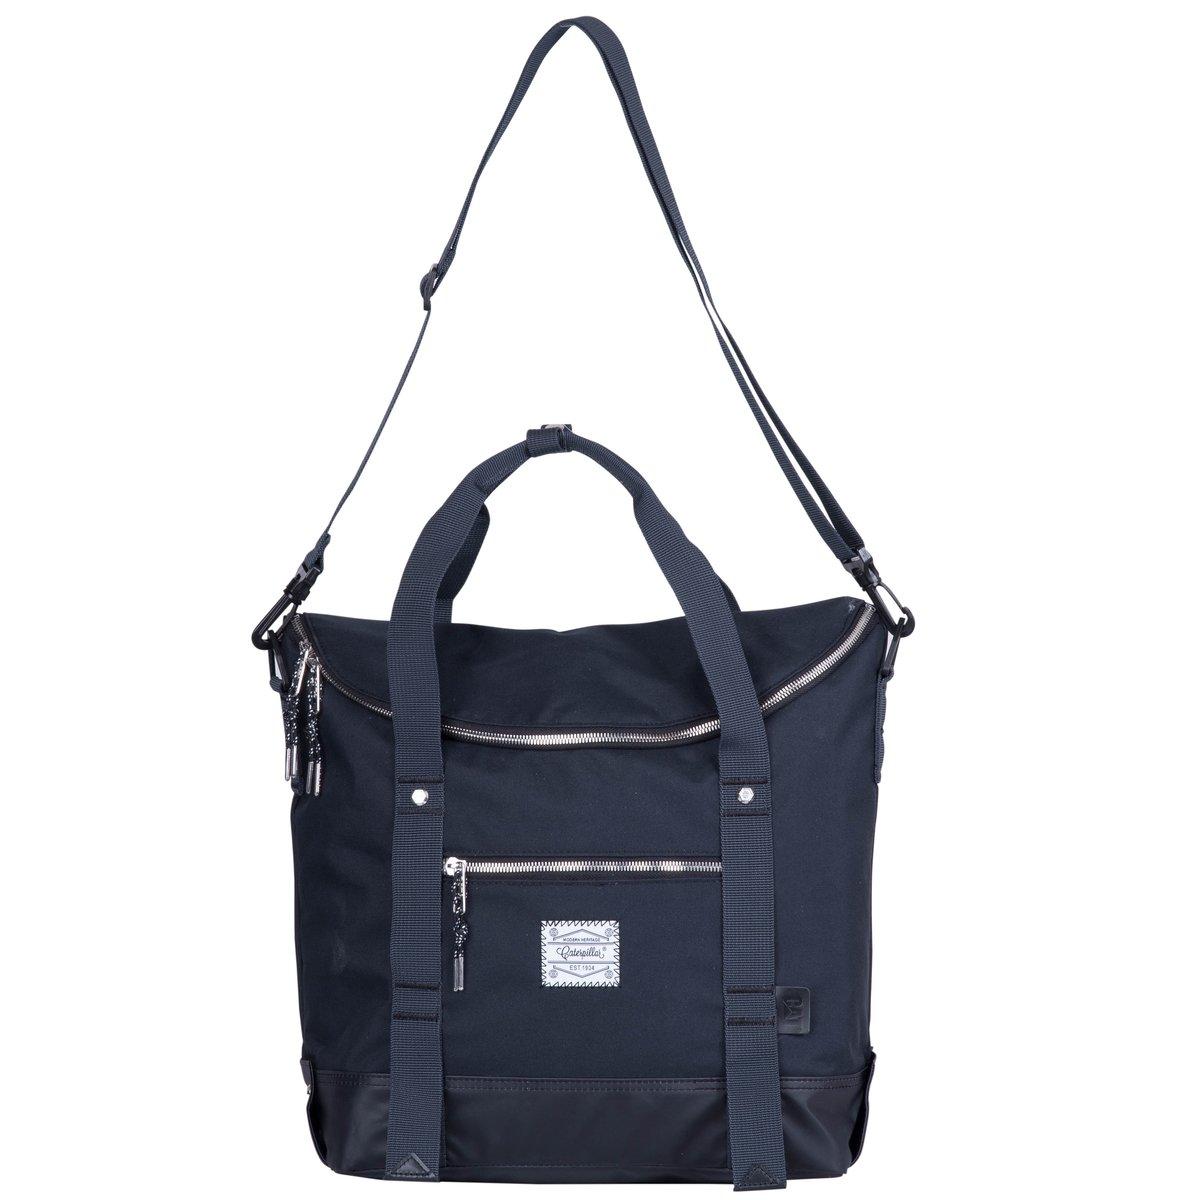 Essential Tote Bag (Black)